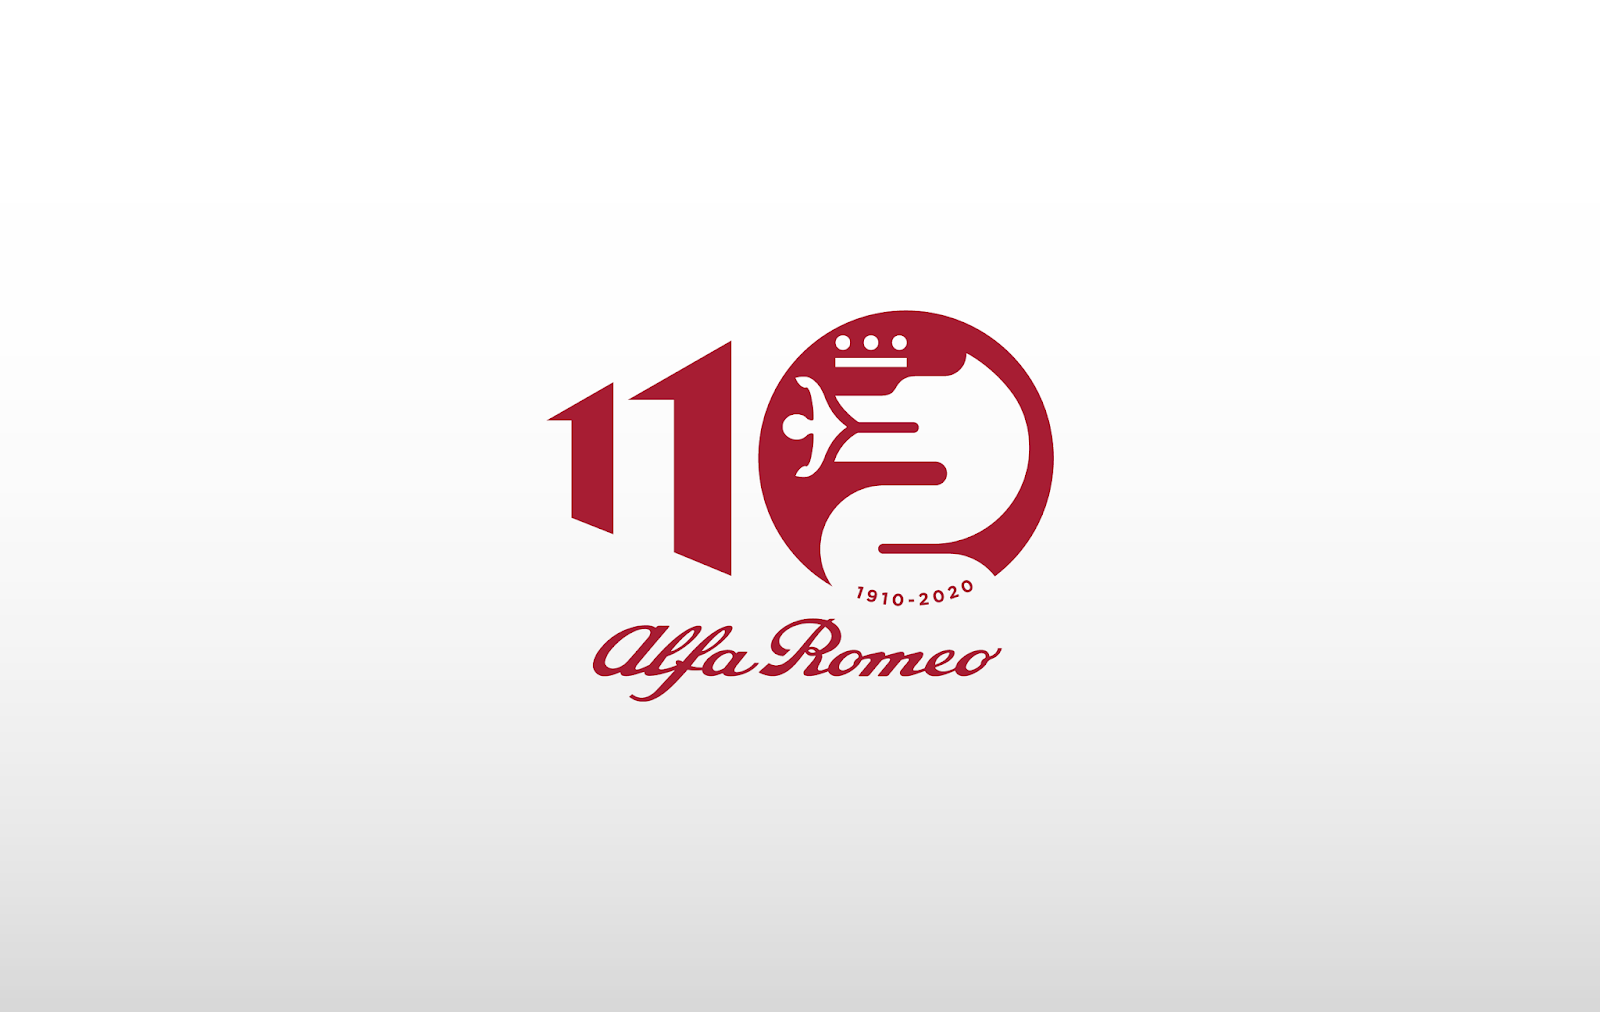 ALFA ROMEO 110 IMMAGINE ARTICOLO Η Alfa Romeo γιορτάζει τα 110 της χρόνια με νέο σήμα! Alfa, alfa romeo, Alfa Romeo Giulia QV, Alfa Romeo Stelvio, zblog